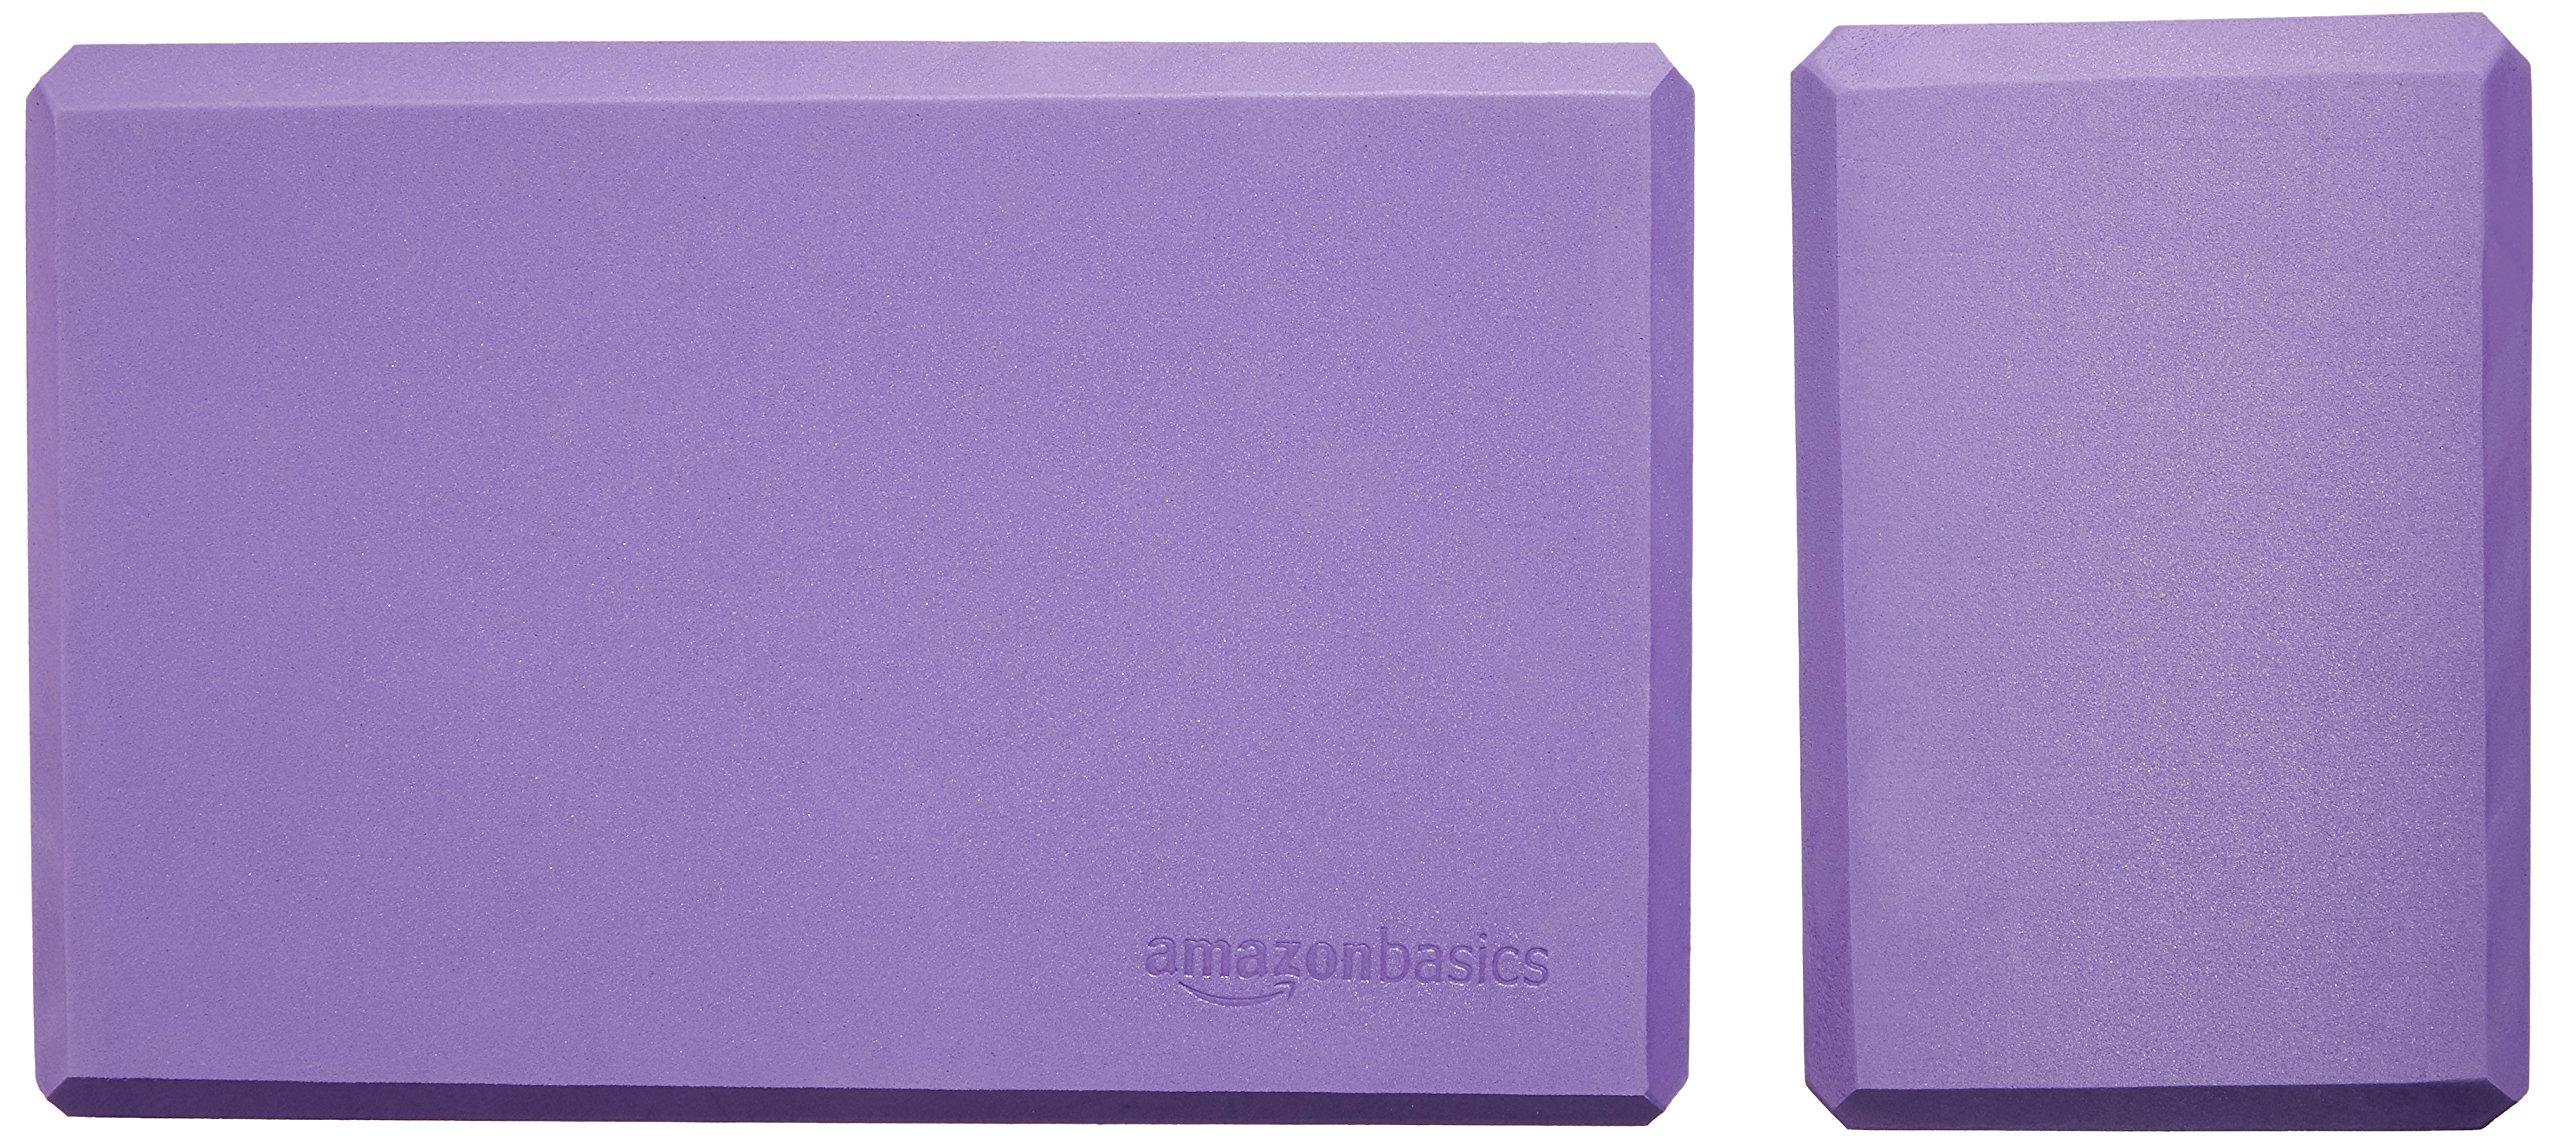 AmazonBasics Foam Yoga Blocks - 4 x 9 x 6 Inches, Set of 2, Purple by AmazonBasics (Image #6)